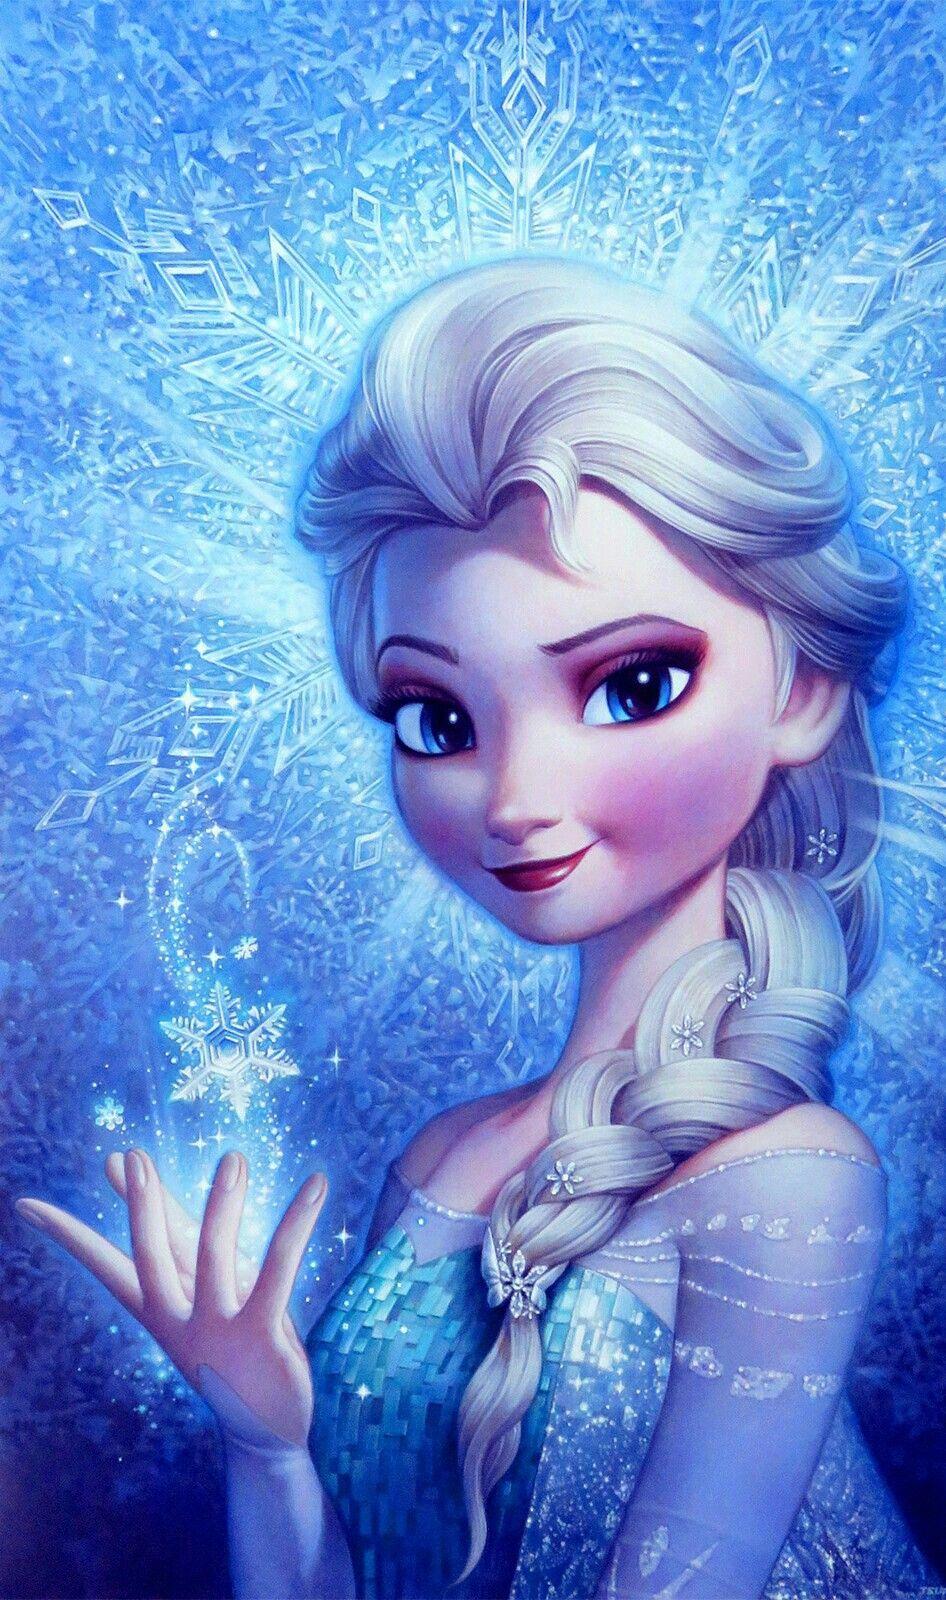 Elsa From Frozen Imagenes De Frozen Elsa Disney Imagenes Fondo De Pantalla De Frozen